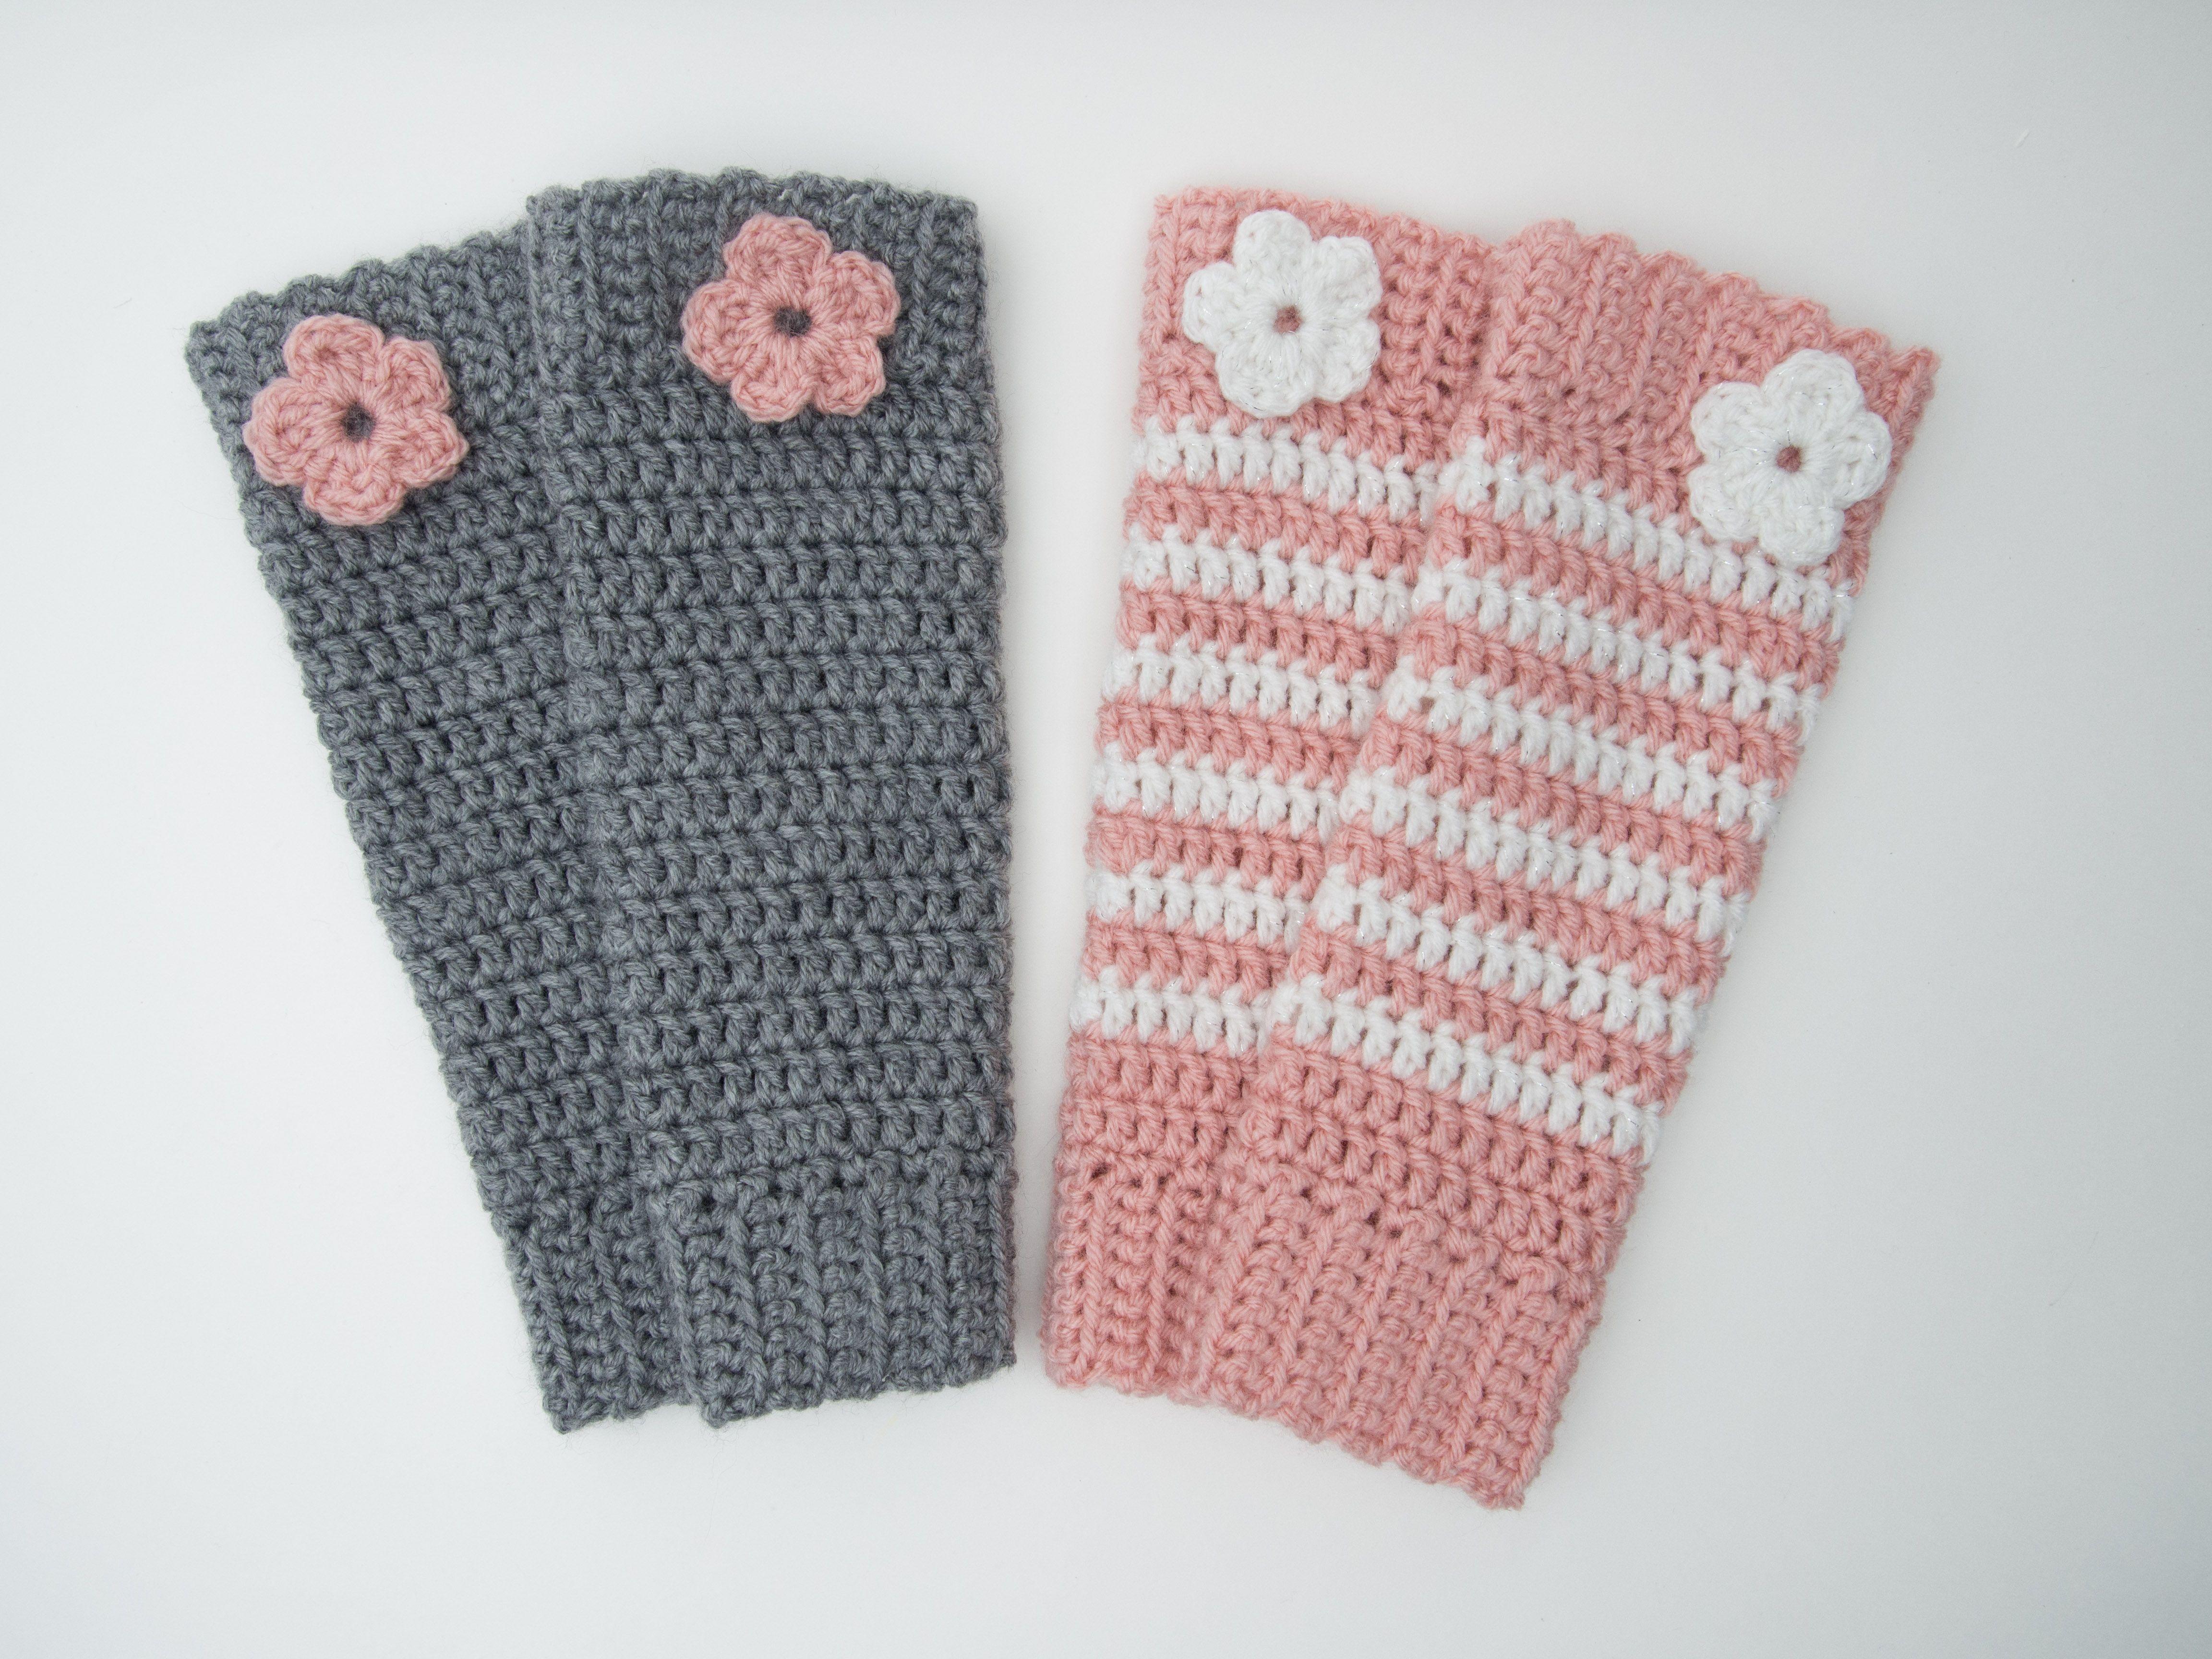 Crocheted Leg Warmers from whatsknottolove.ca #crochet #legwarmers ...